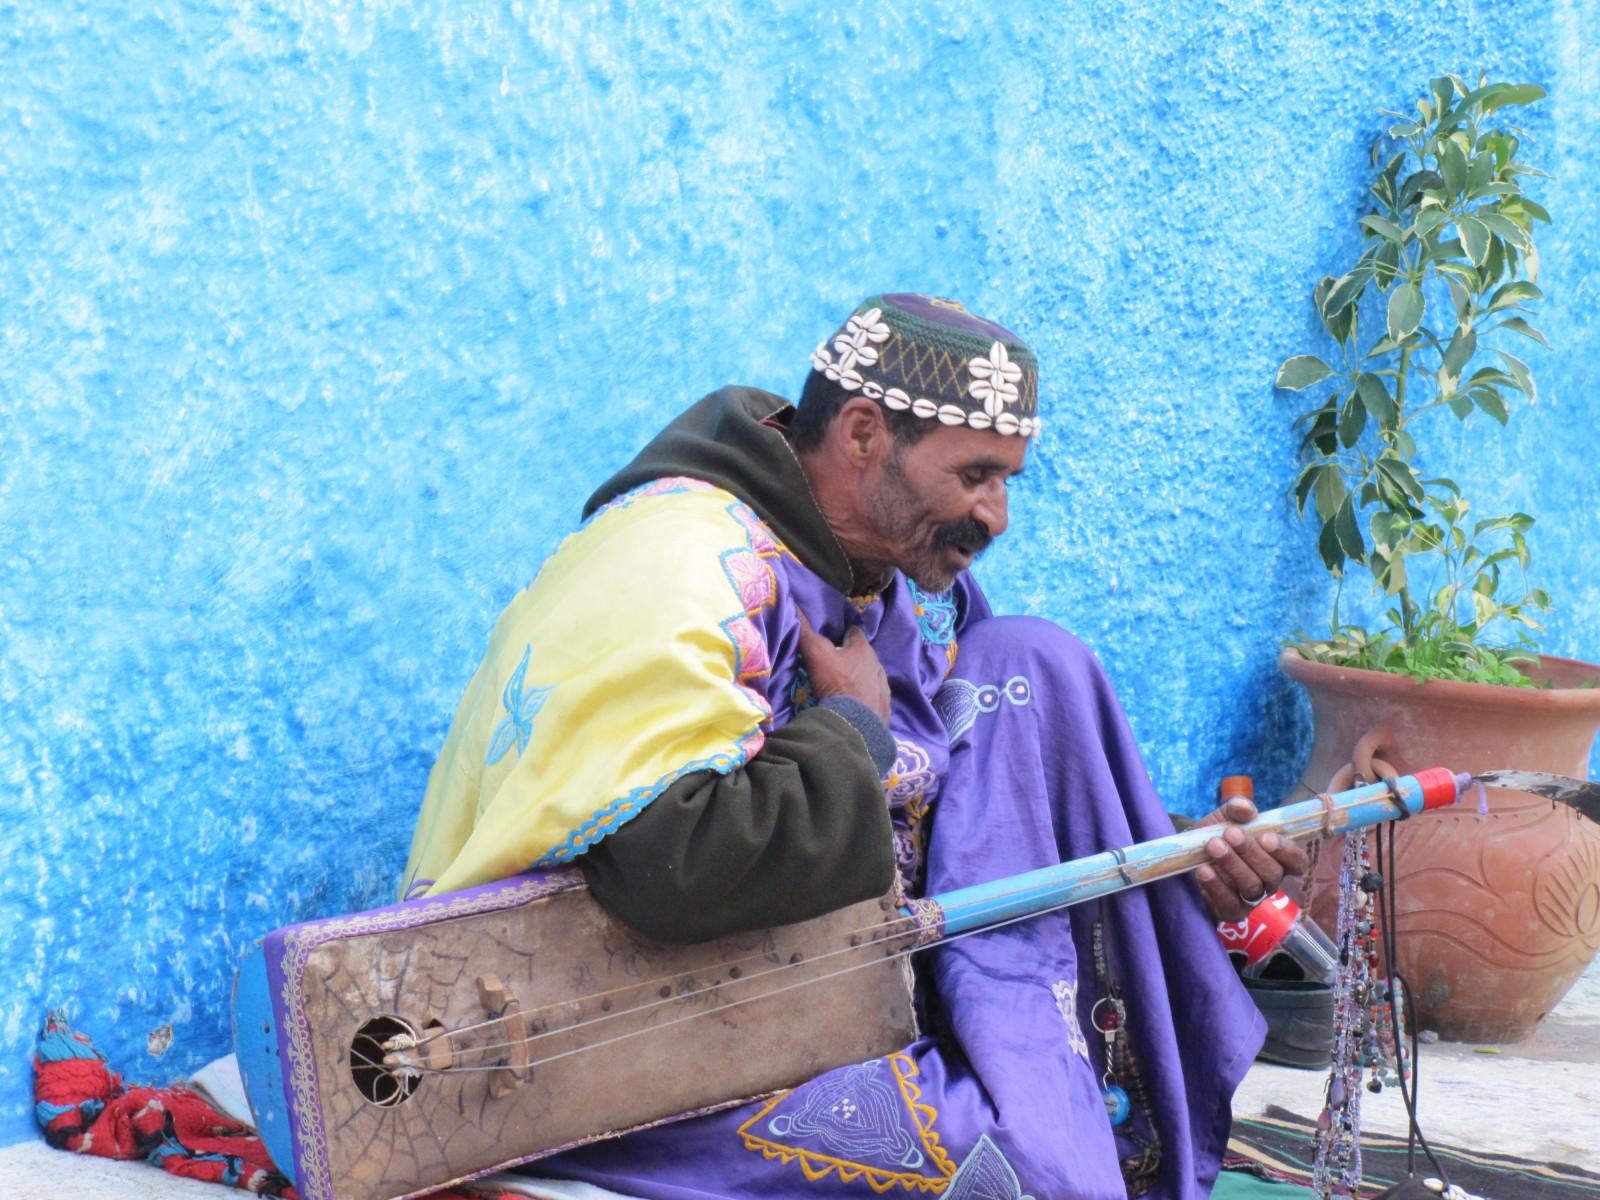 Musical instruments archives trevor 39 s travels trevor 39 s for Morocco motors erie pa